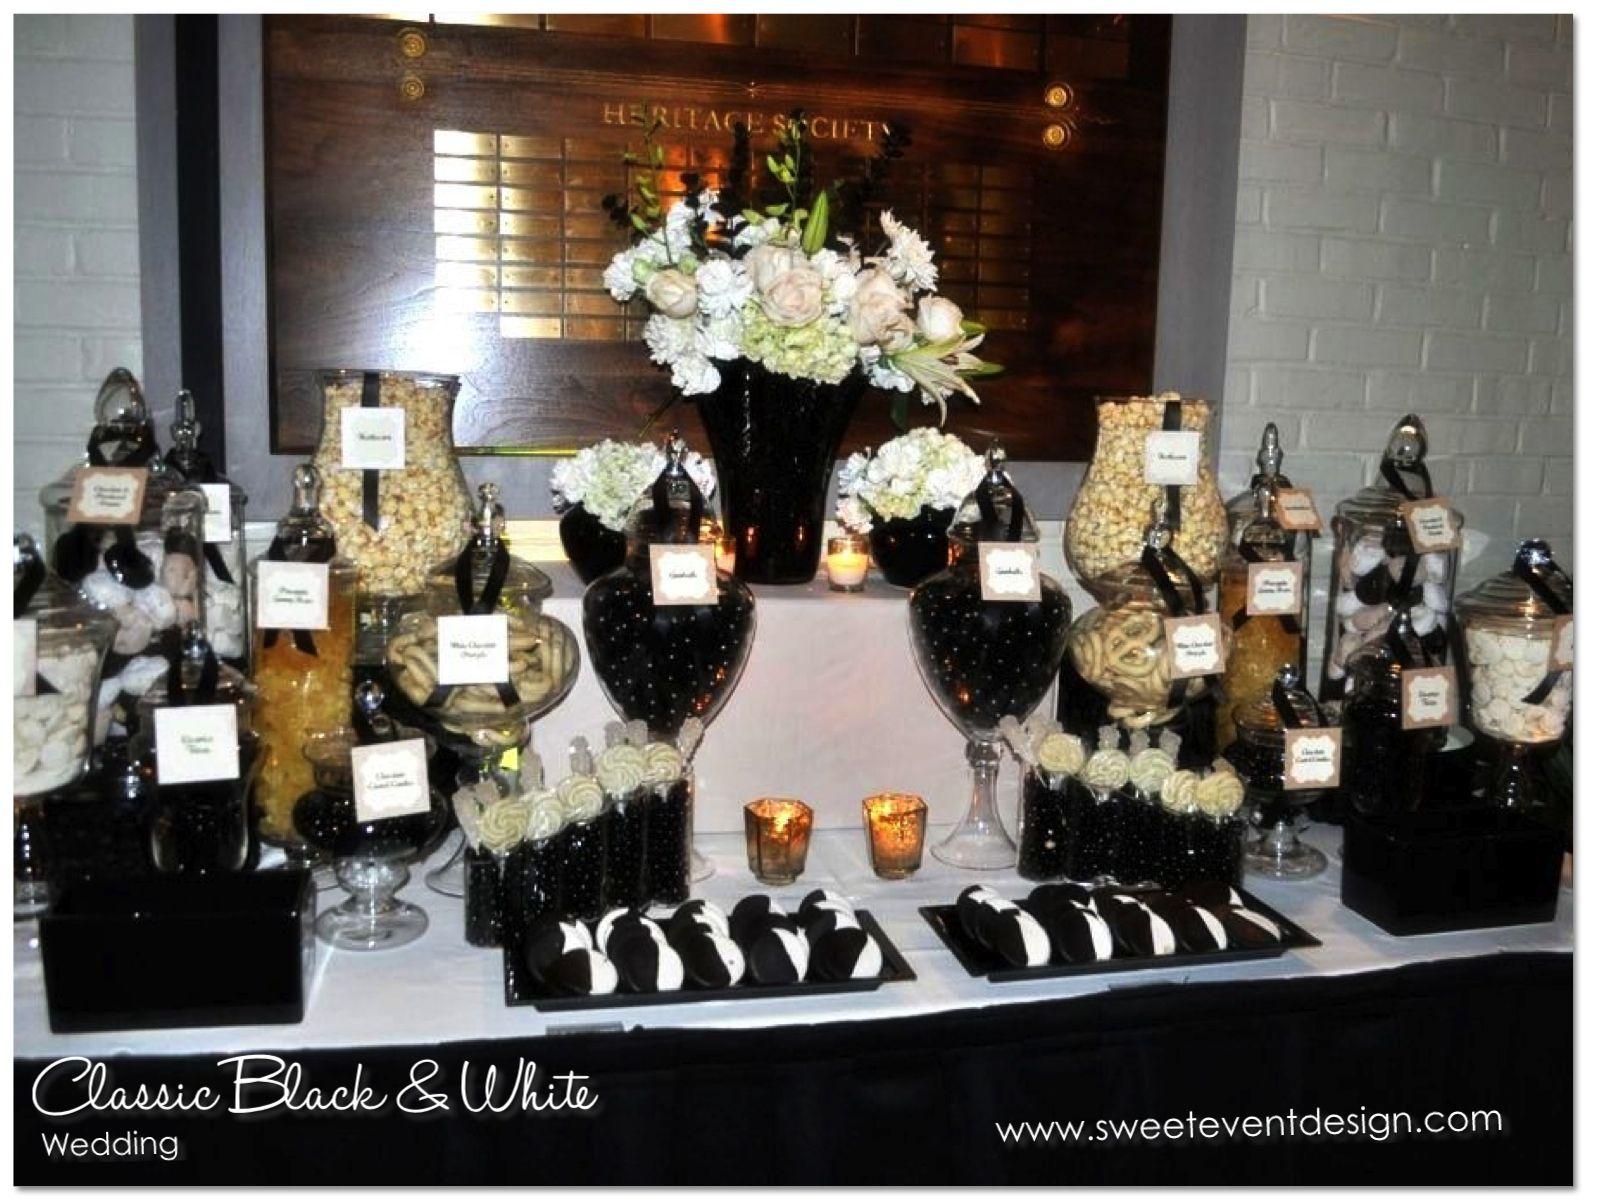 Pinterest Black And White Wedding Black White Champagne Wedding Candy Candy Station Wedding Black And White Wedding Theme Wedding Reception Table Decorations